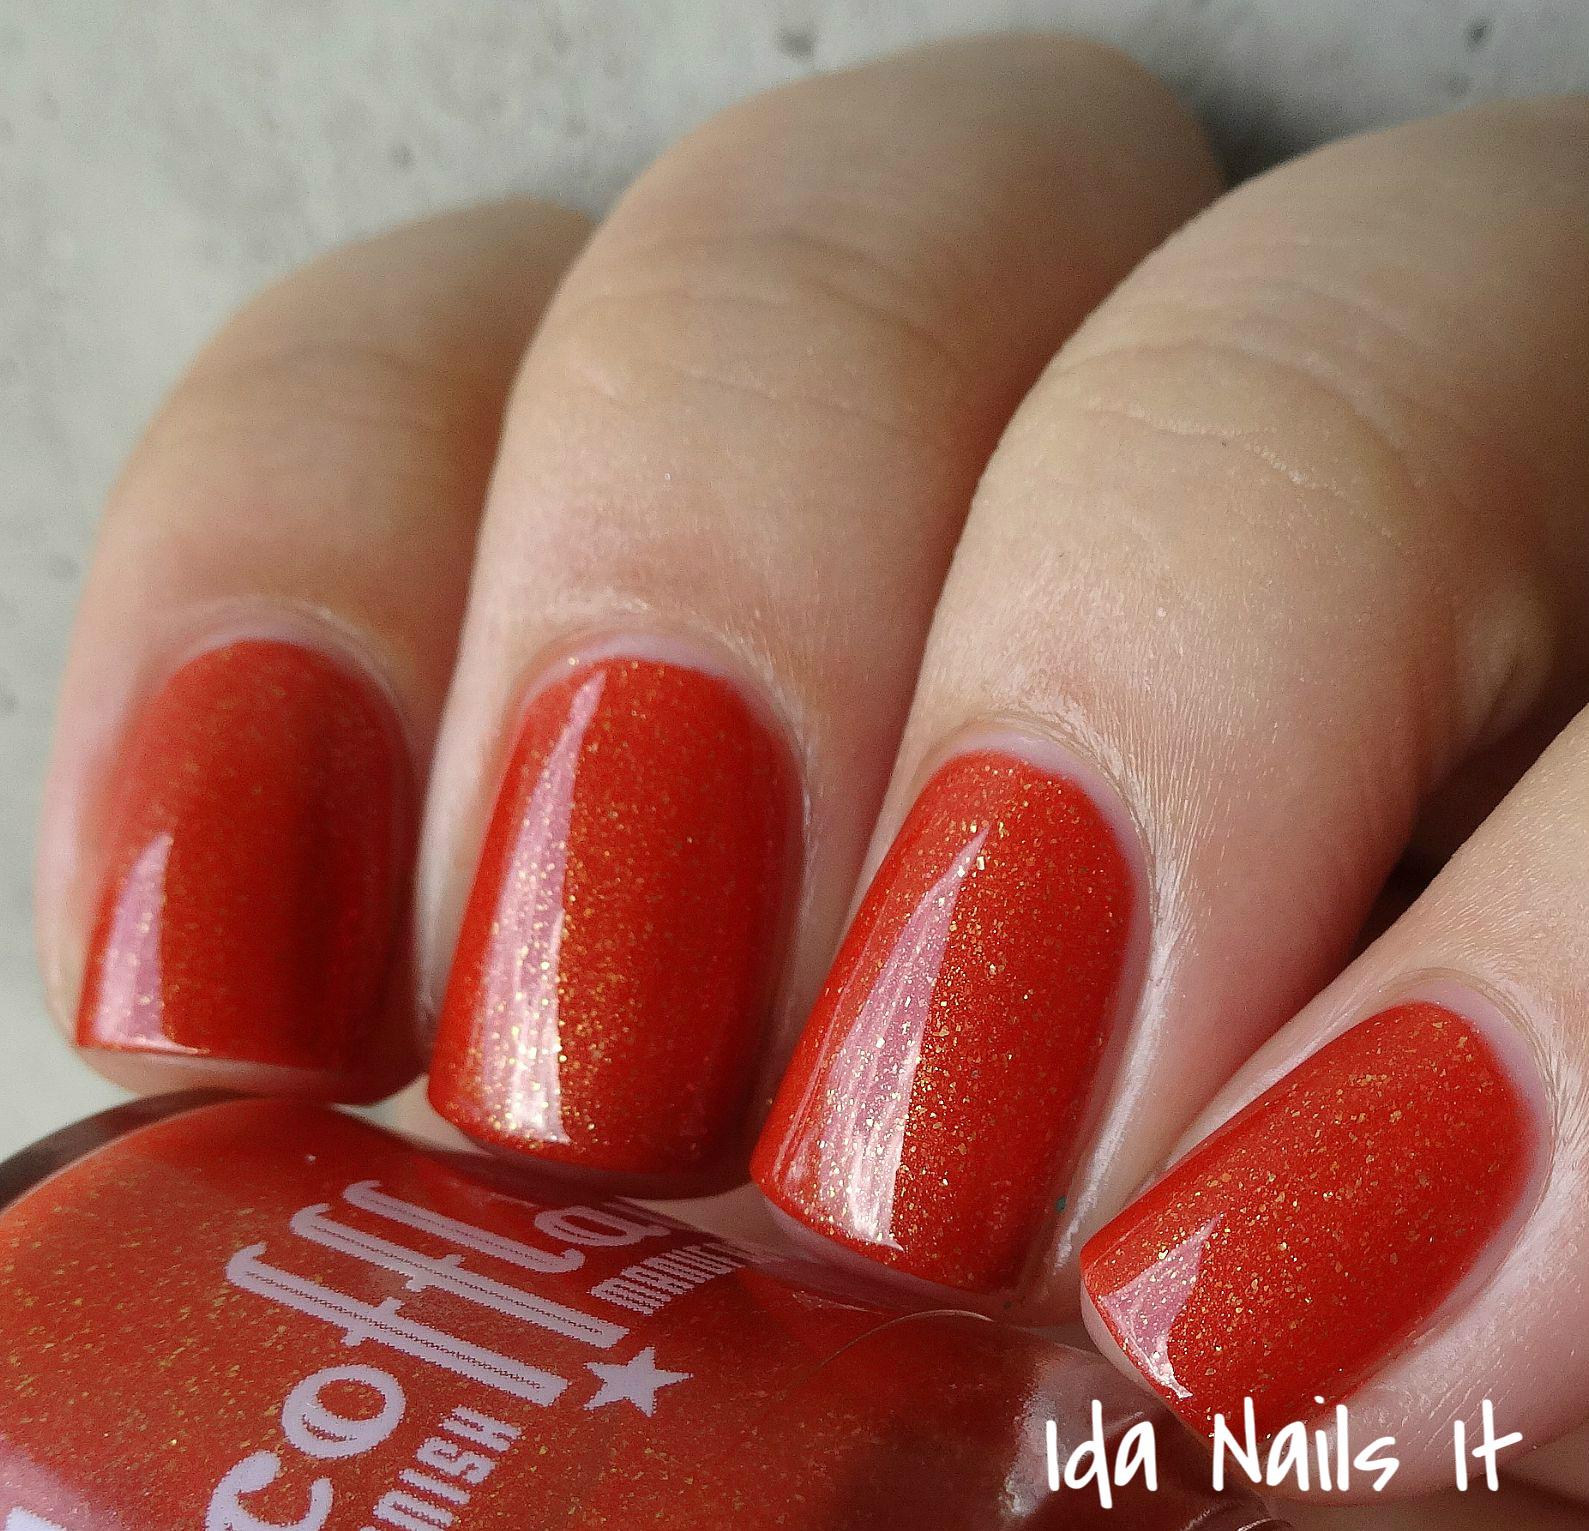 Ida Nails It: Scofflaw Nail Varnish Fall/Autumn 2015